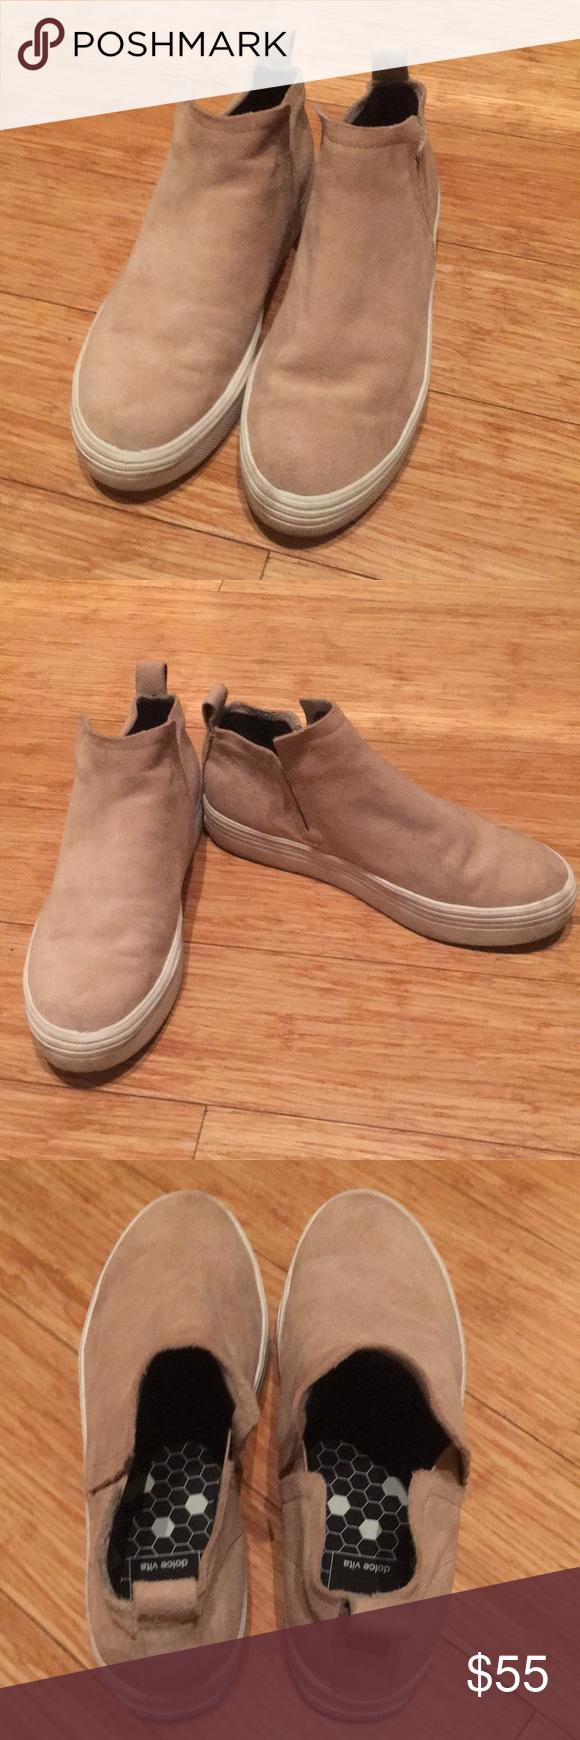 Dolce Vita High Top Sneakers (Tate